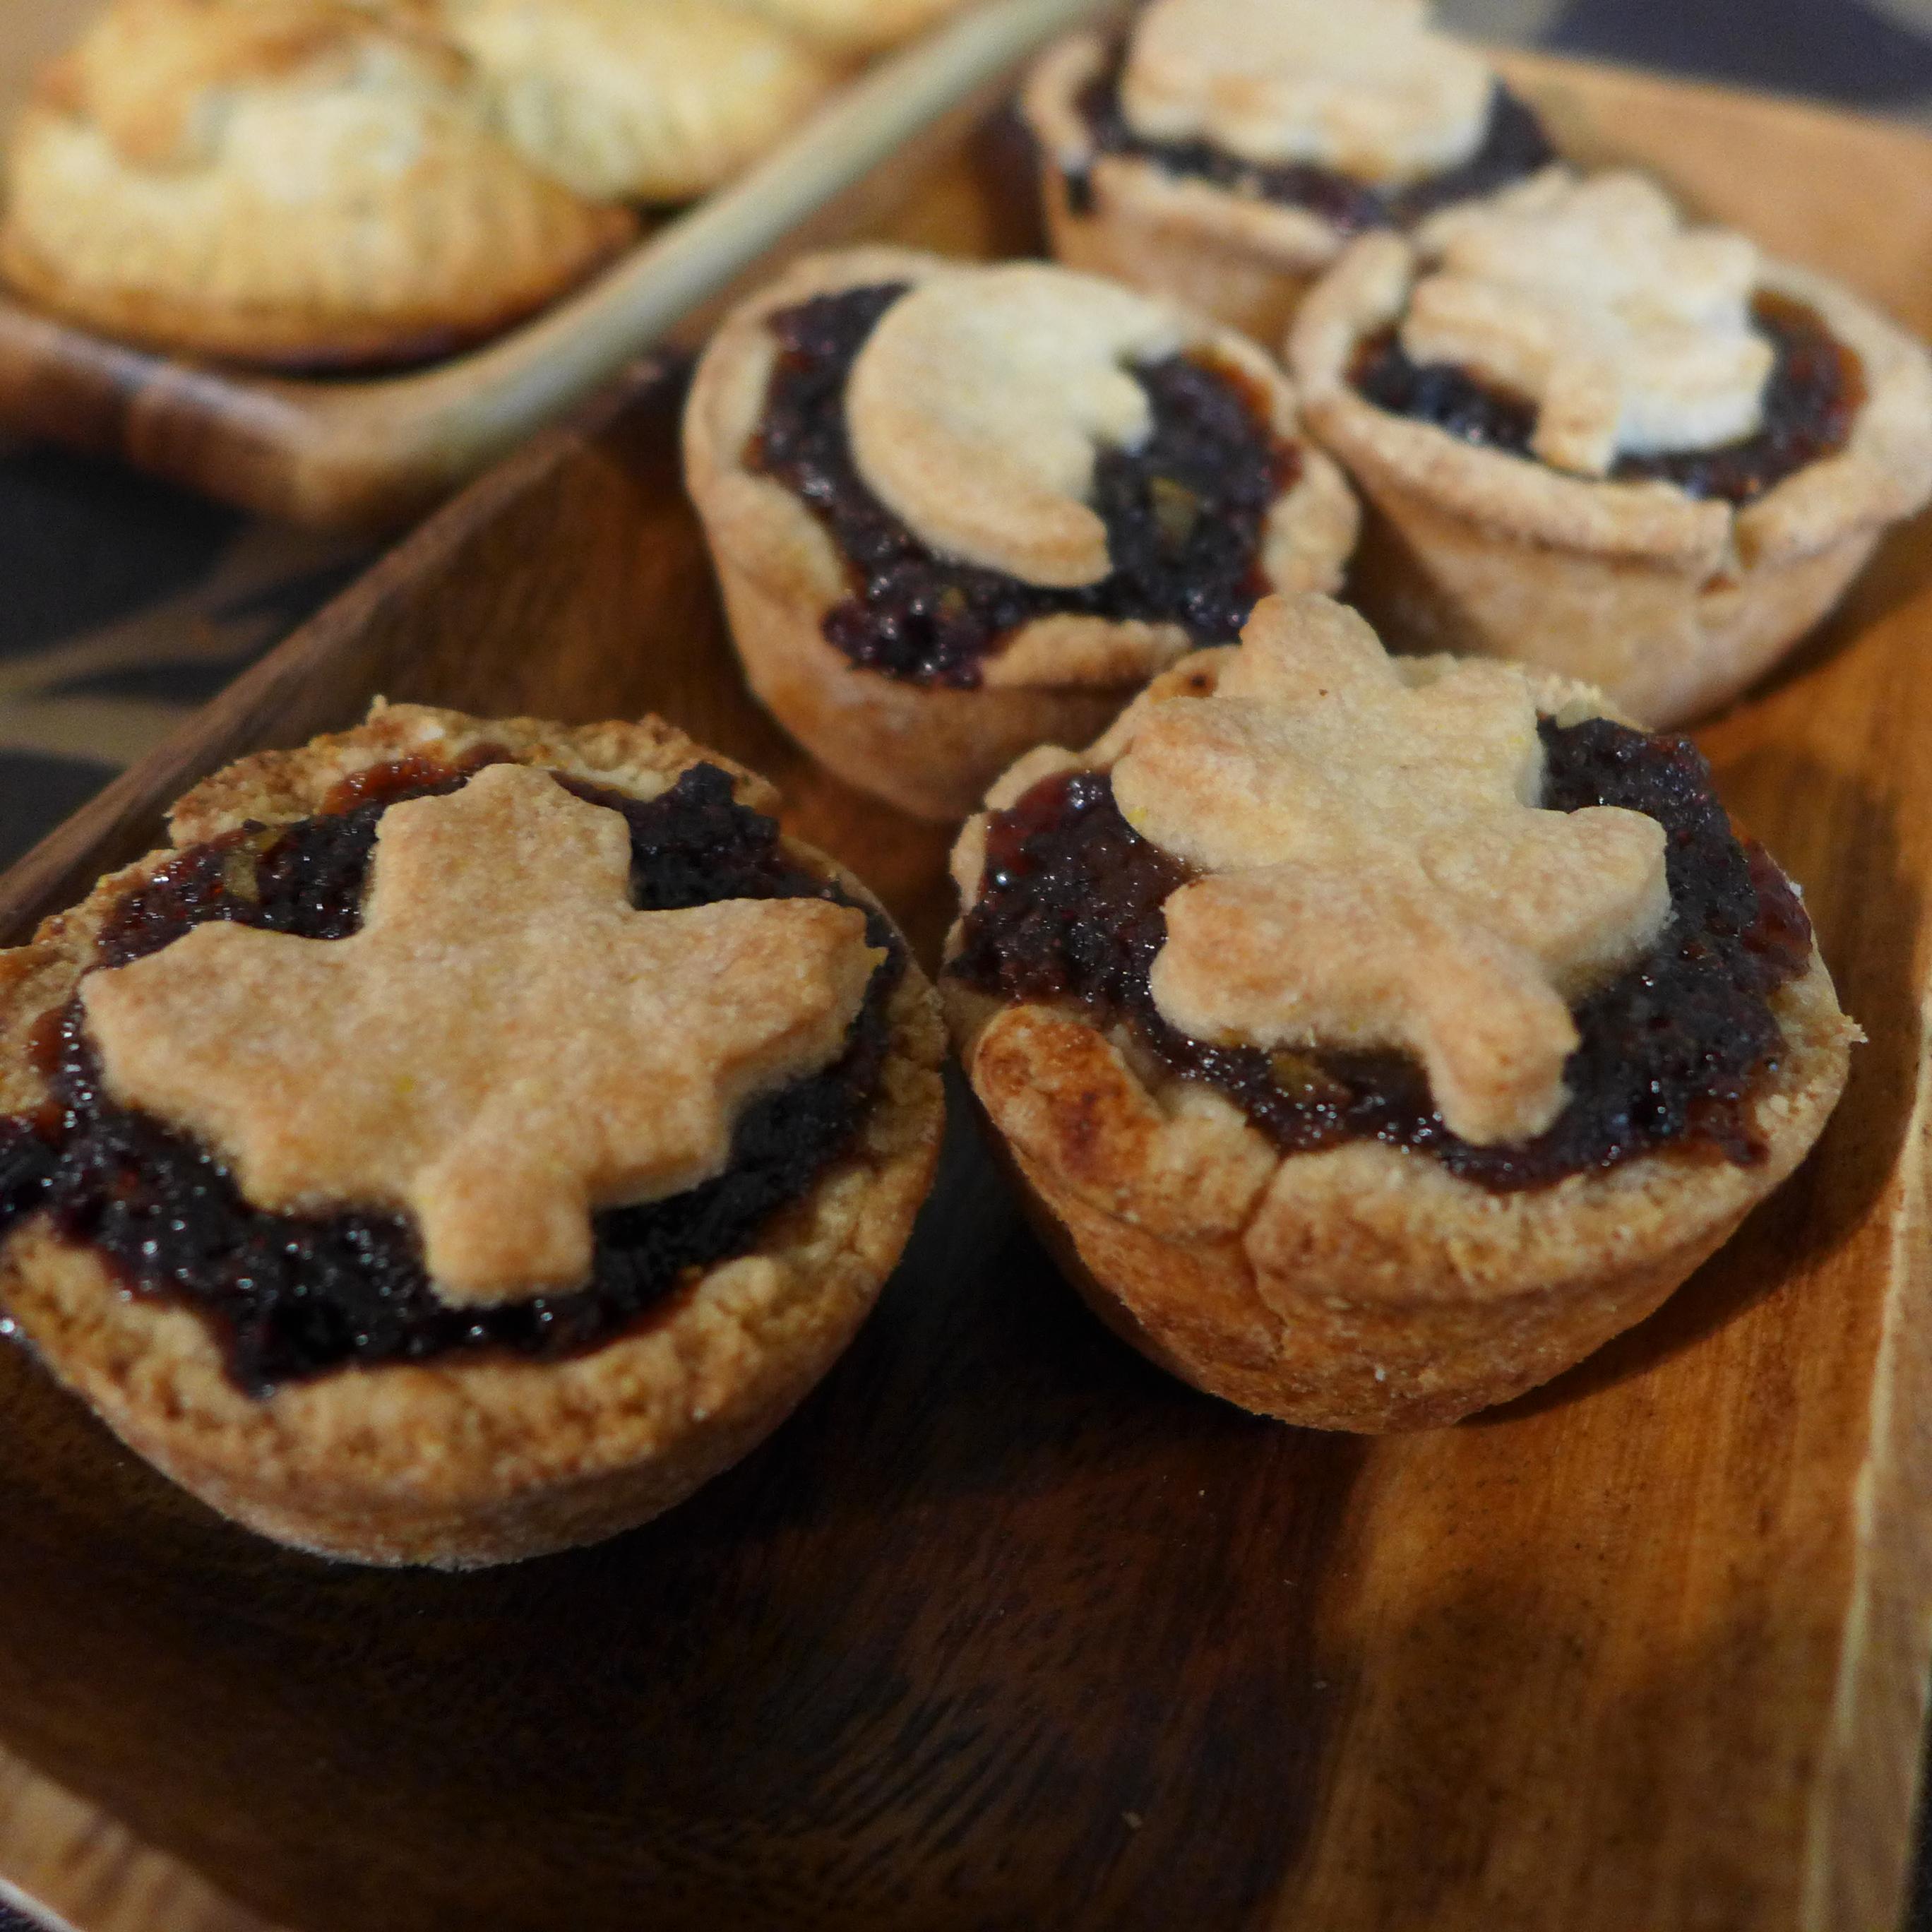 Kitchen Overlord Hobbit Week - Small Adventure Mincemeat Pies